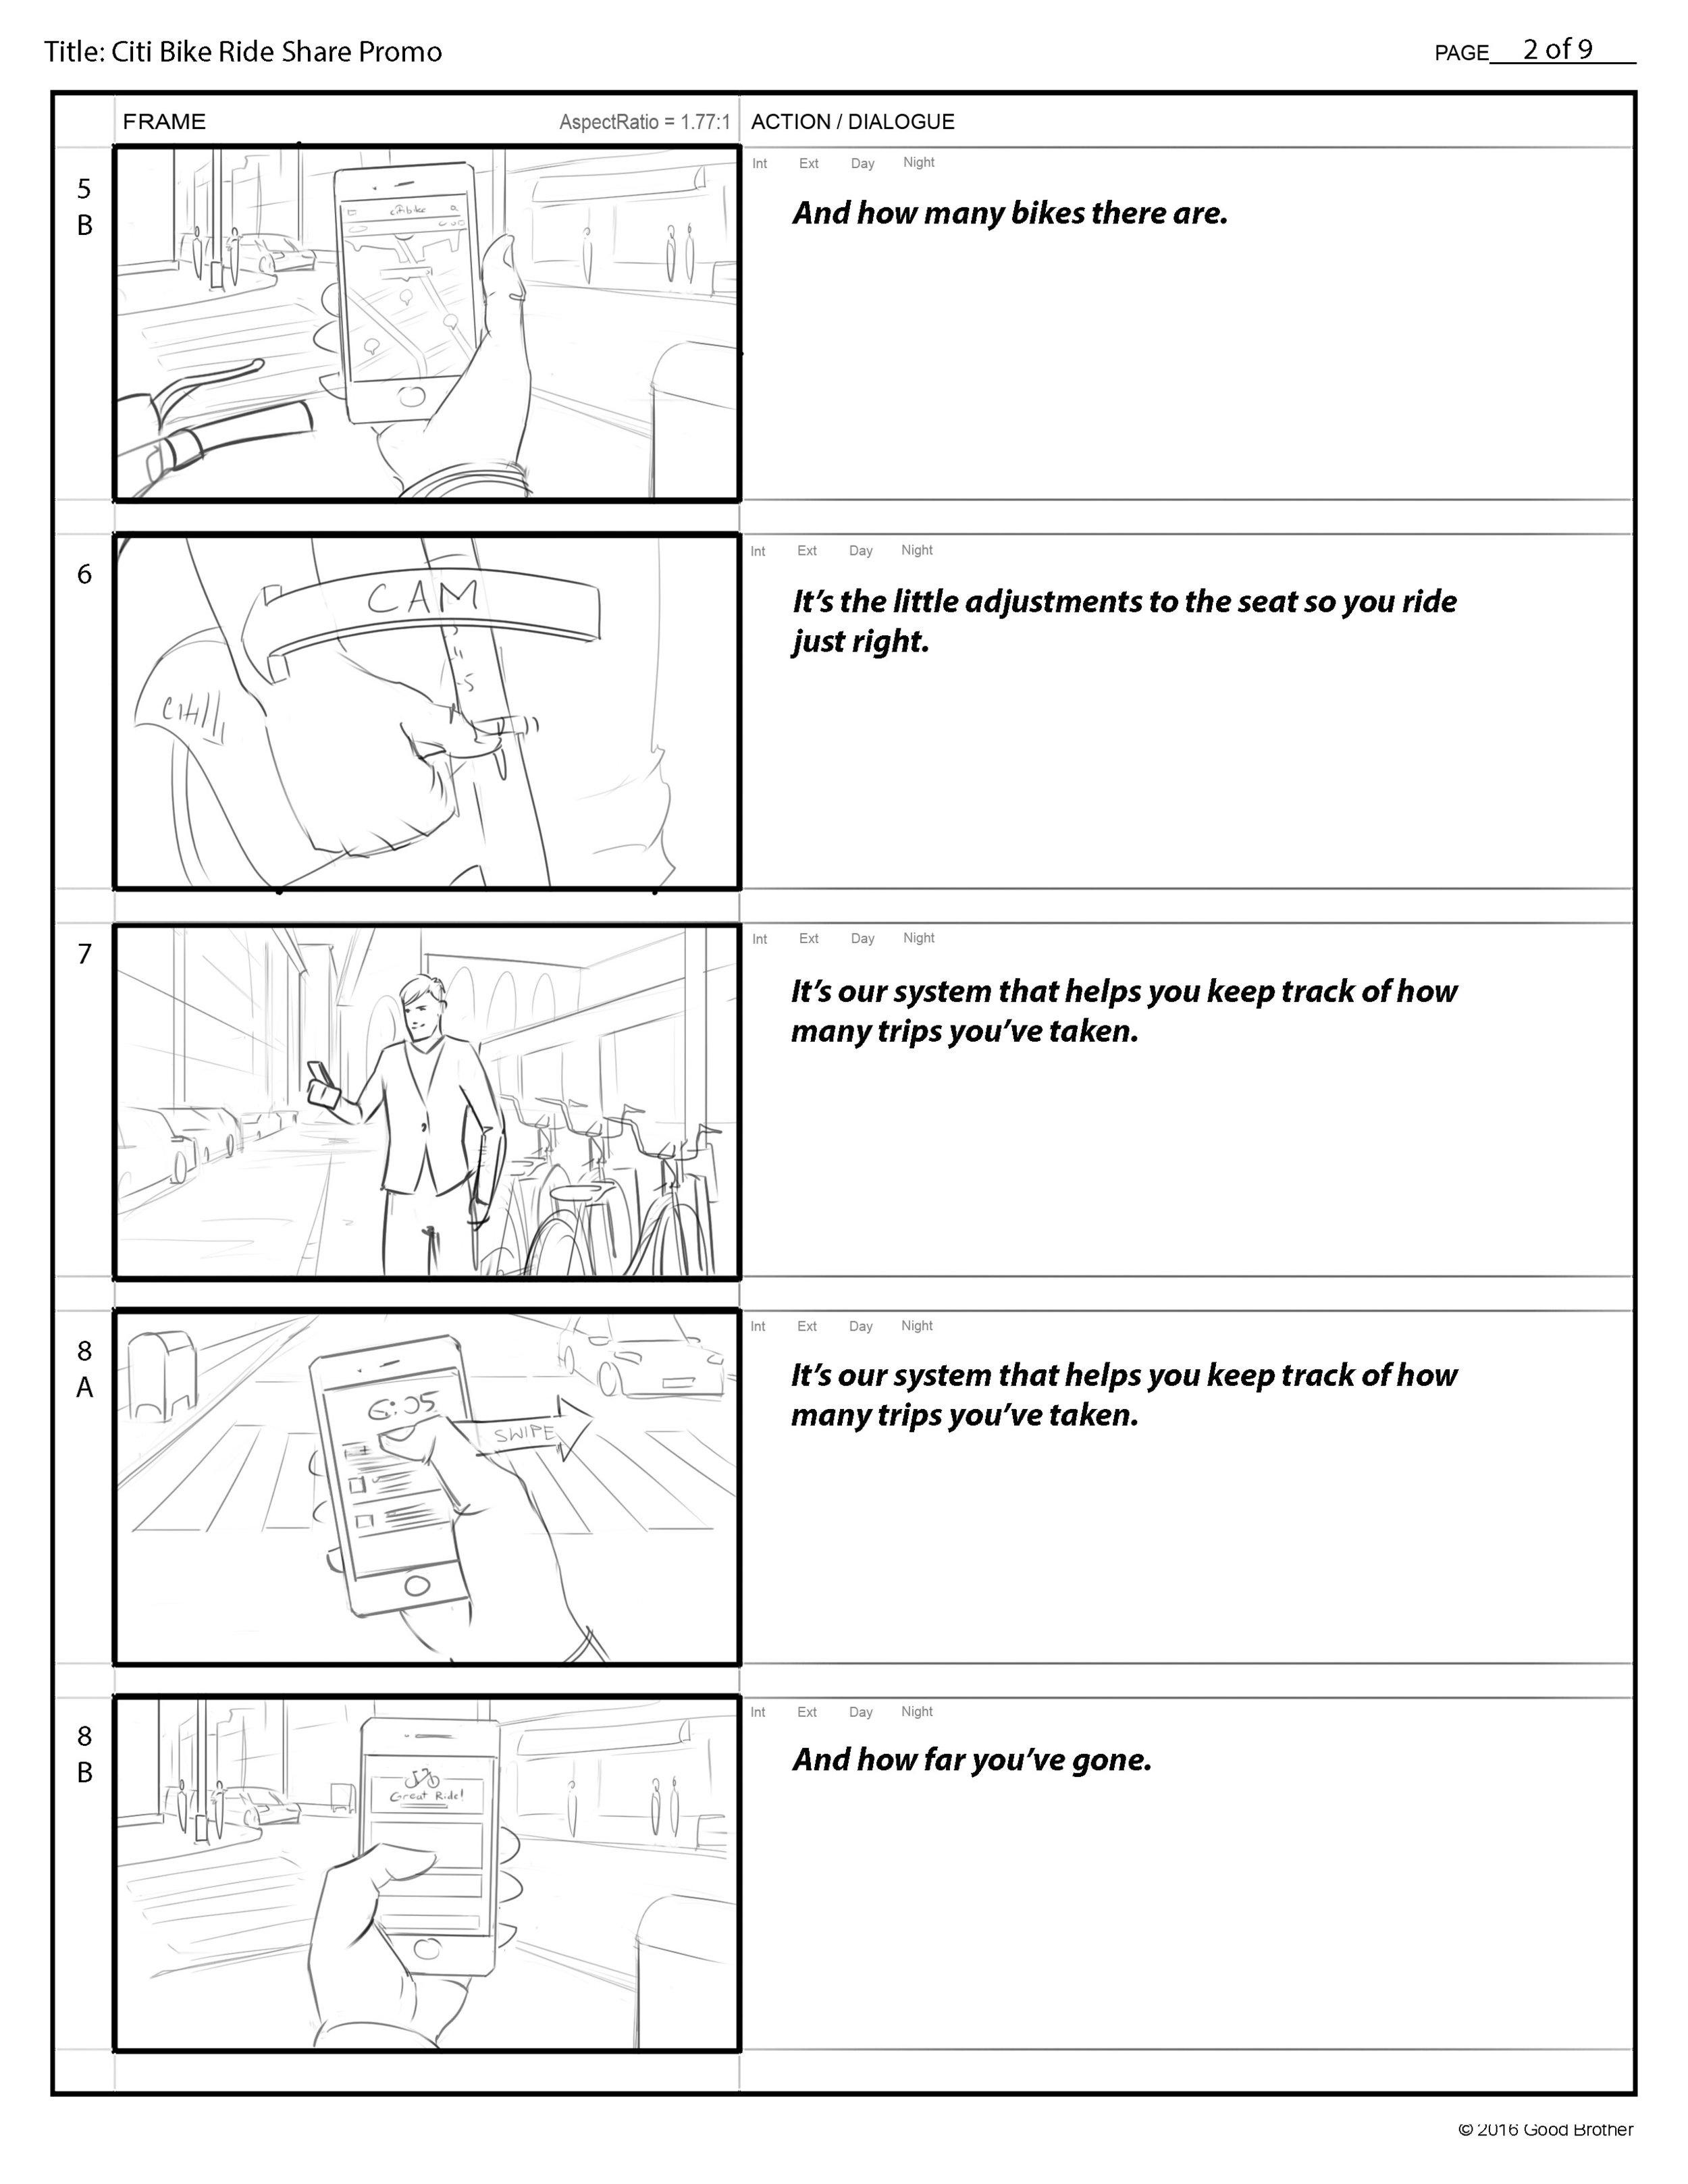 Citi Bike Storyboard FINAL_Page_2.jpg